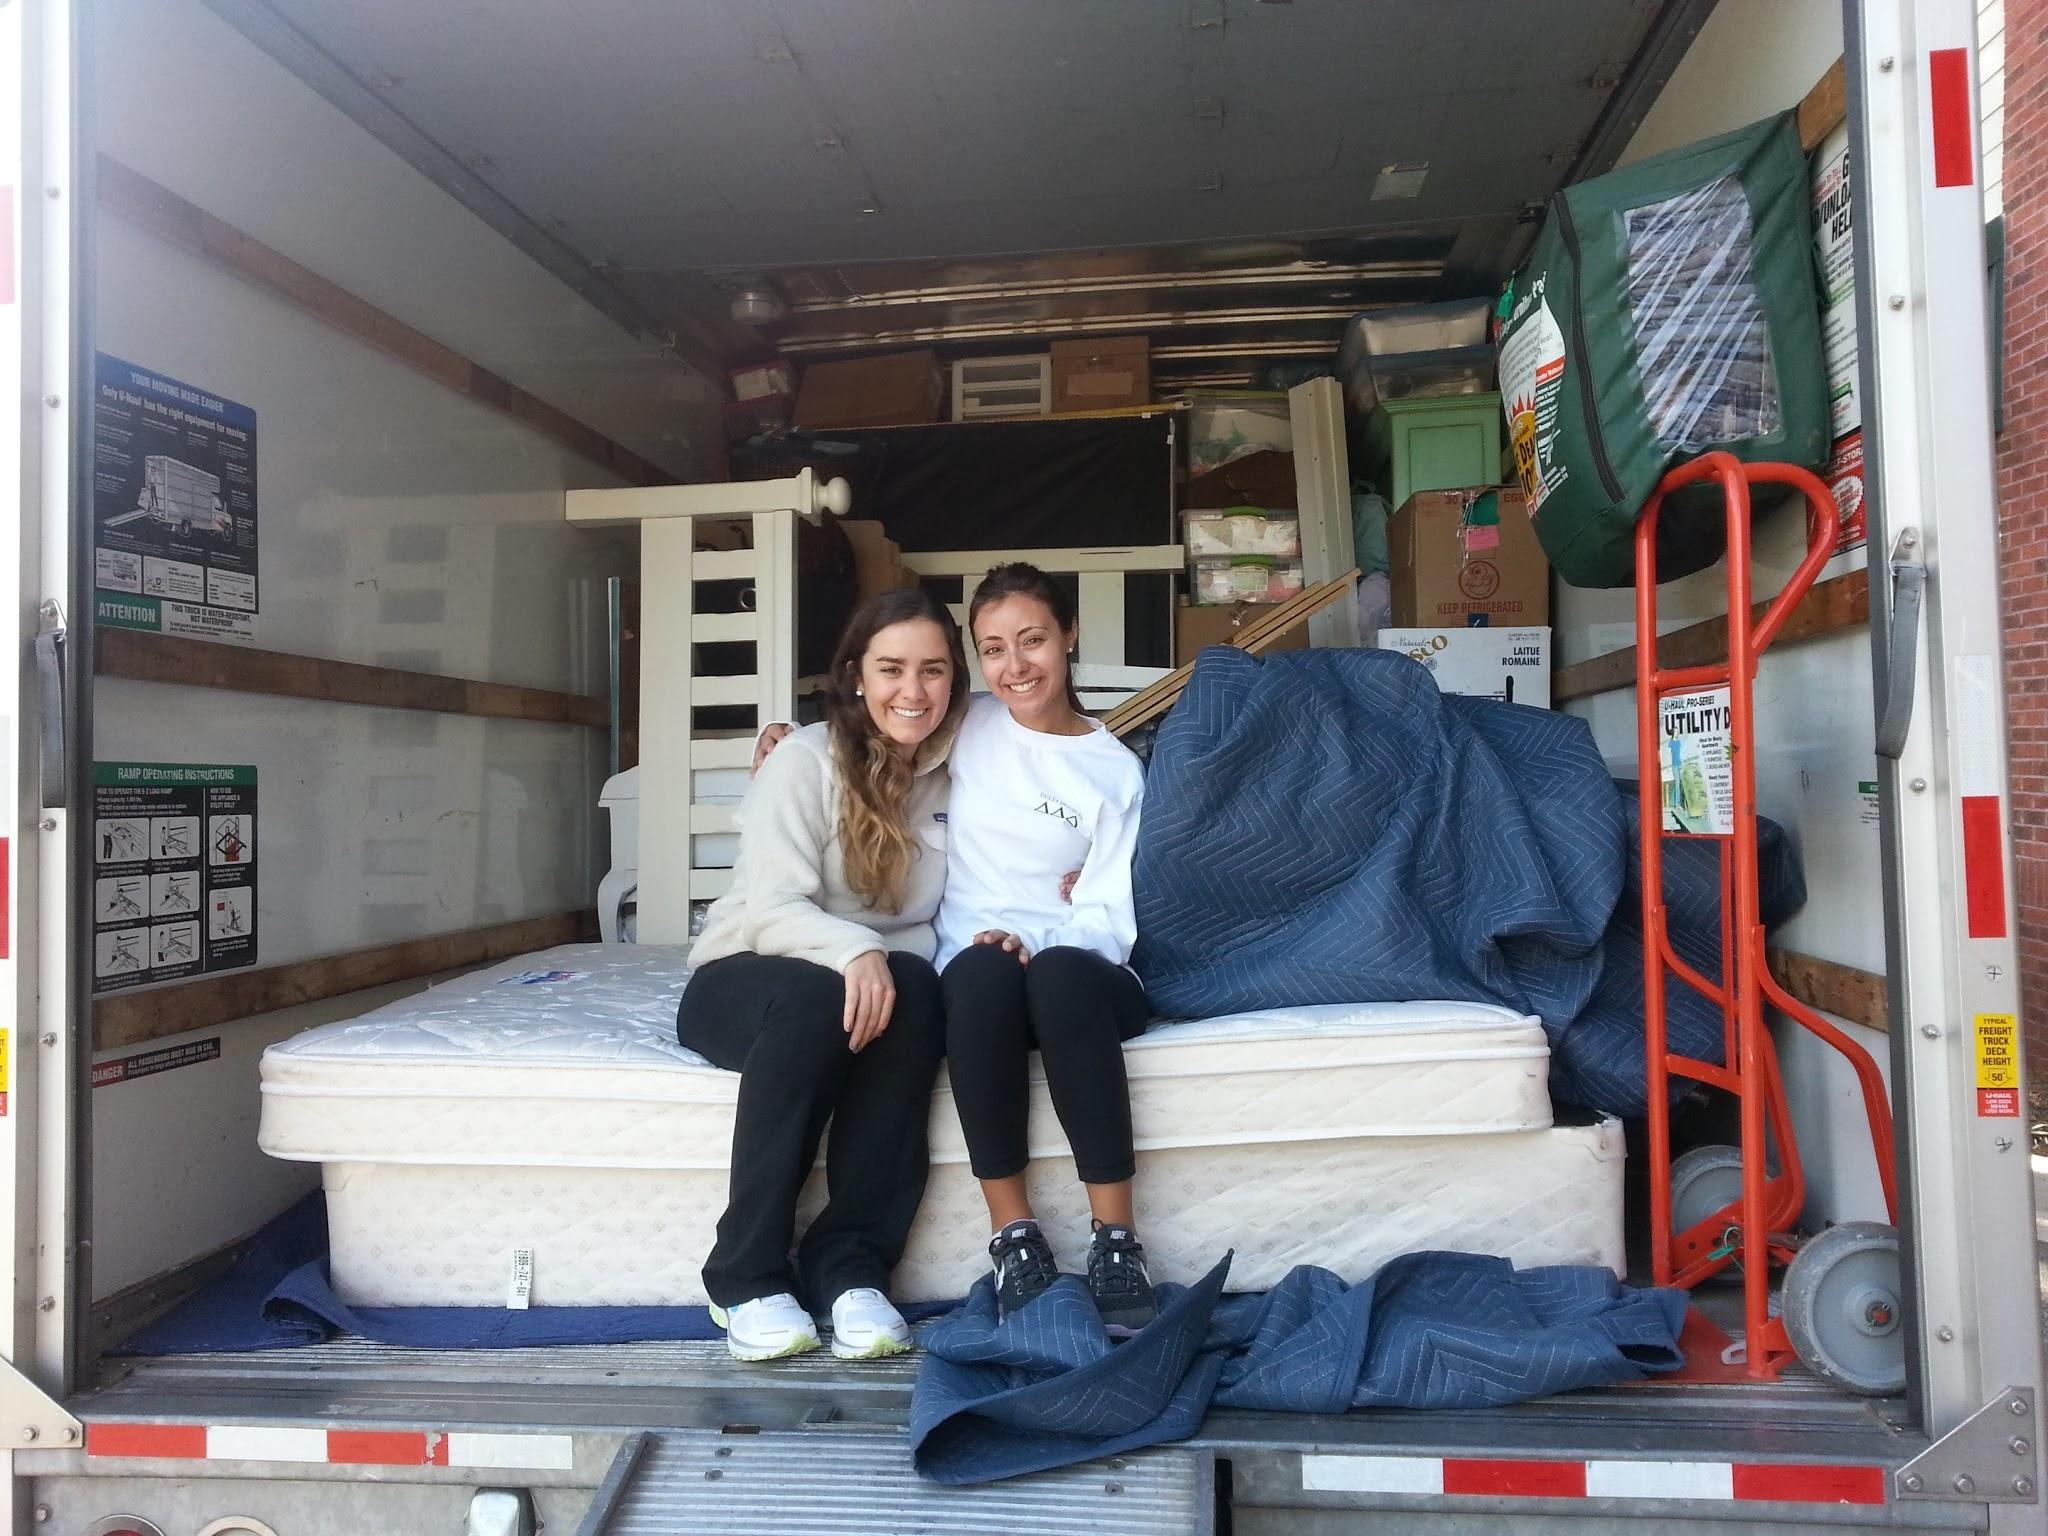 We Love Moving LLC image 91